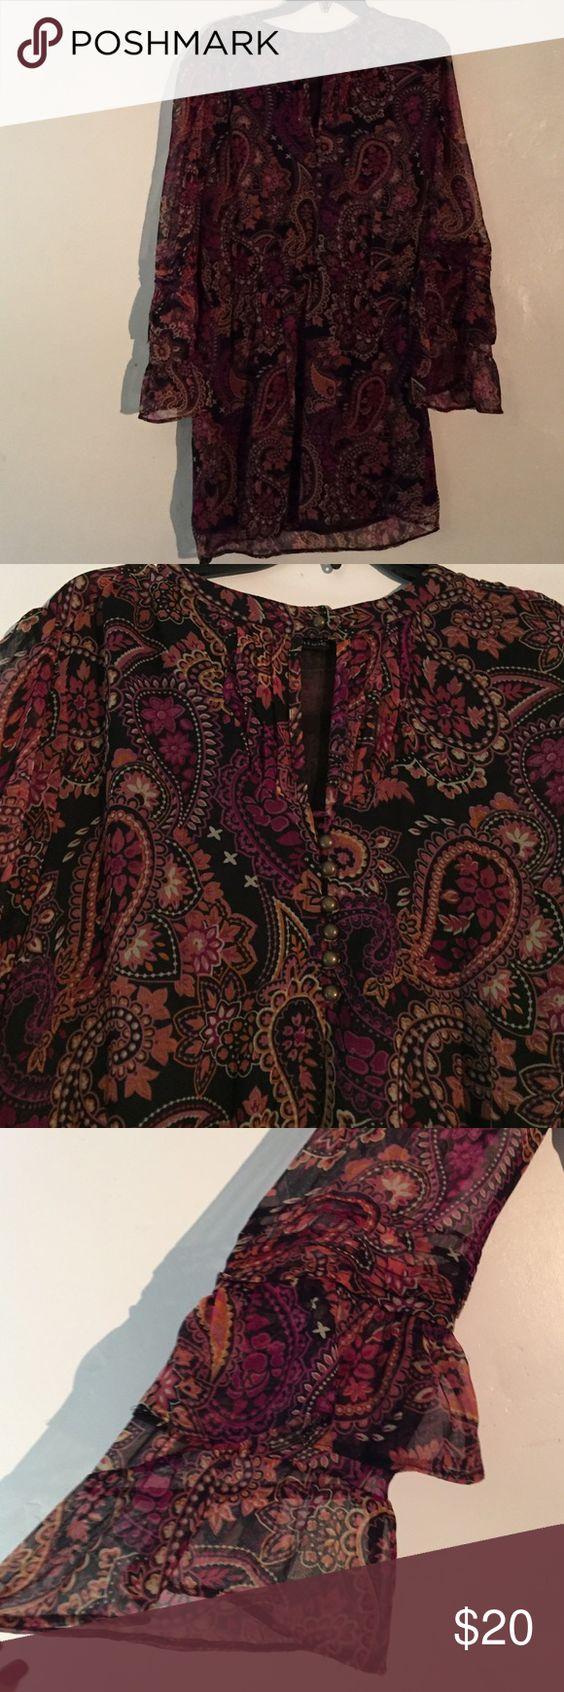 Boho print mini dress Boho print style dress, long sleeve, see through with slip, peek a boo slip on top. Worn once, size M Charlotte Russe Dresses Mini